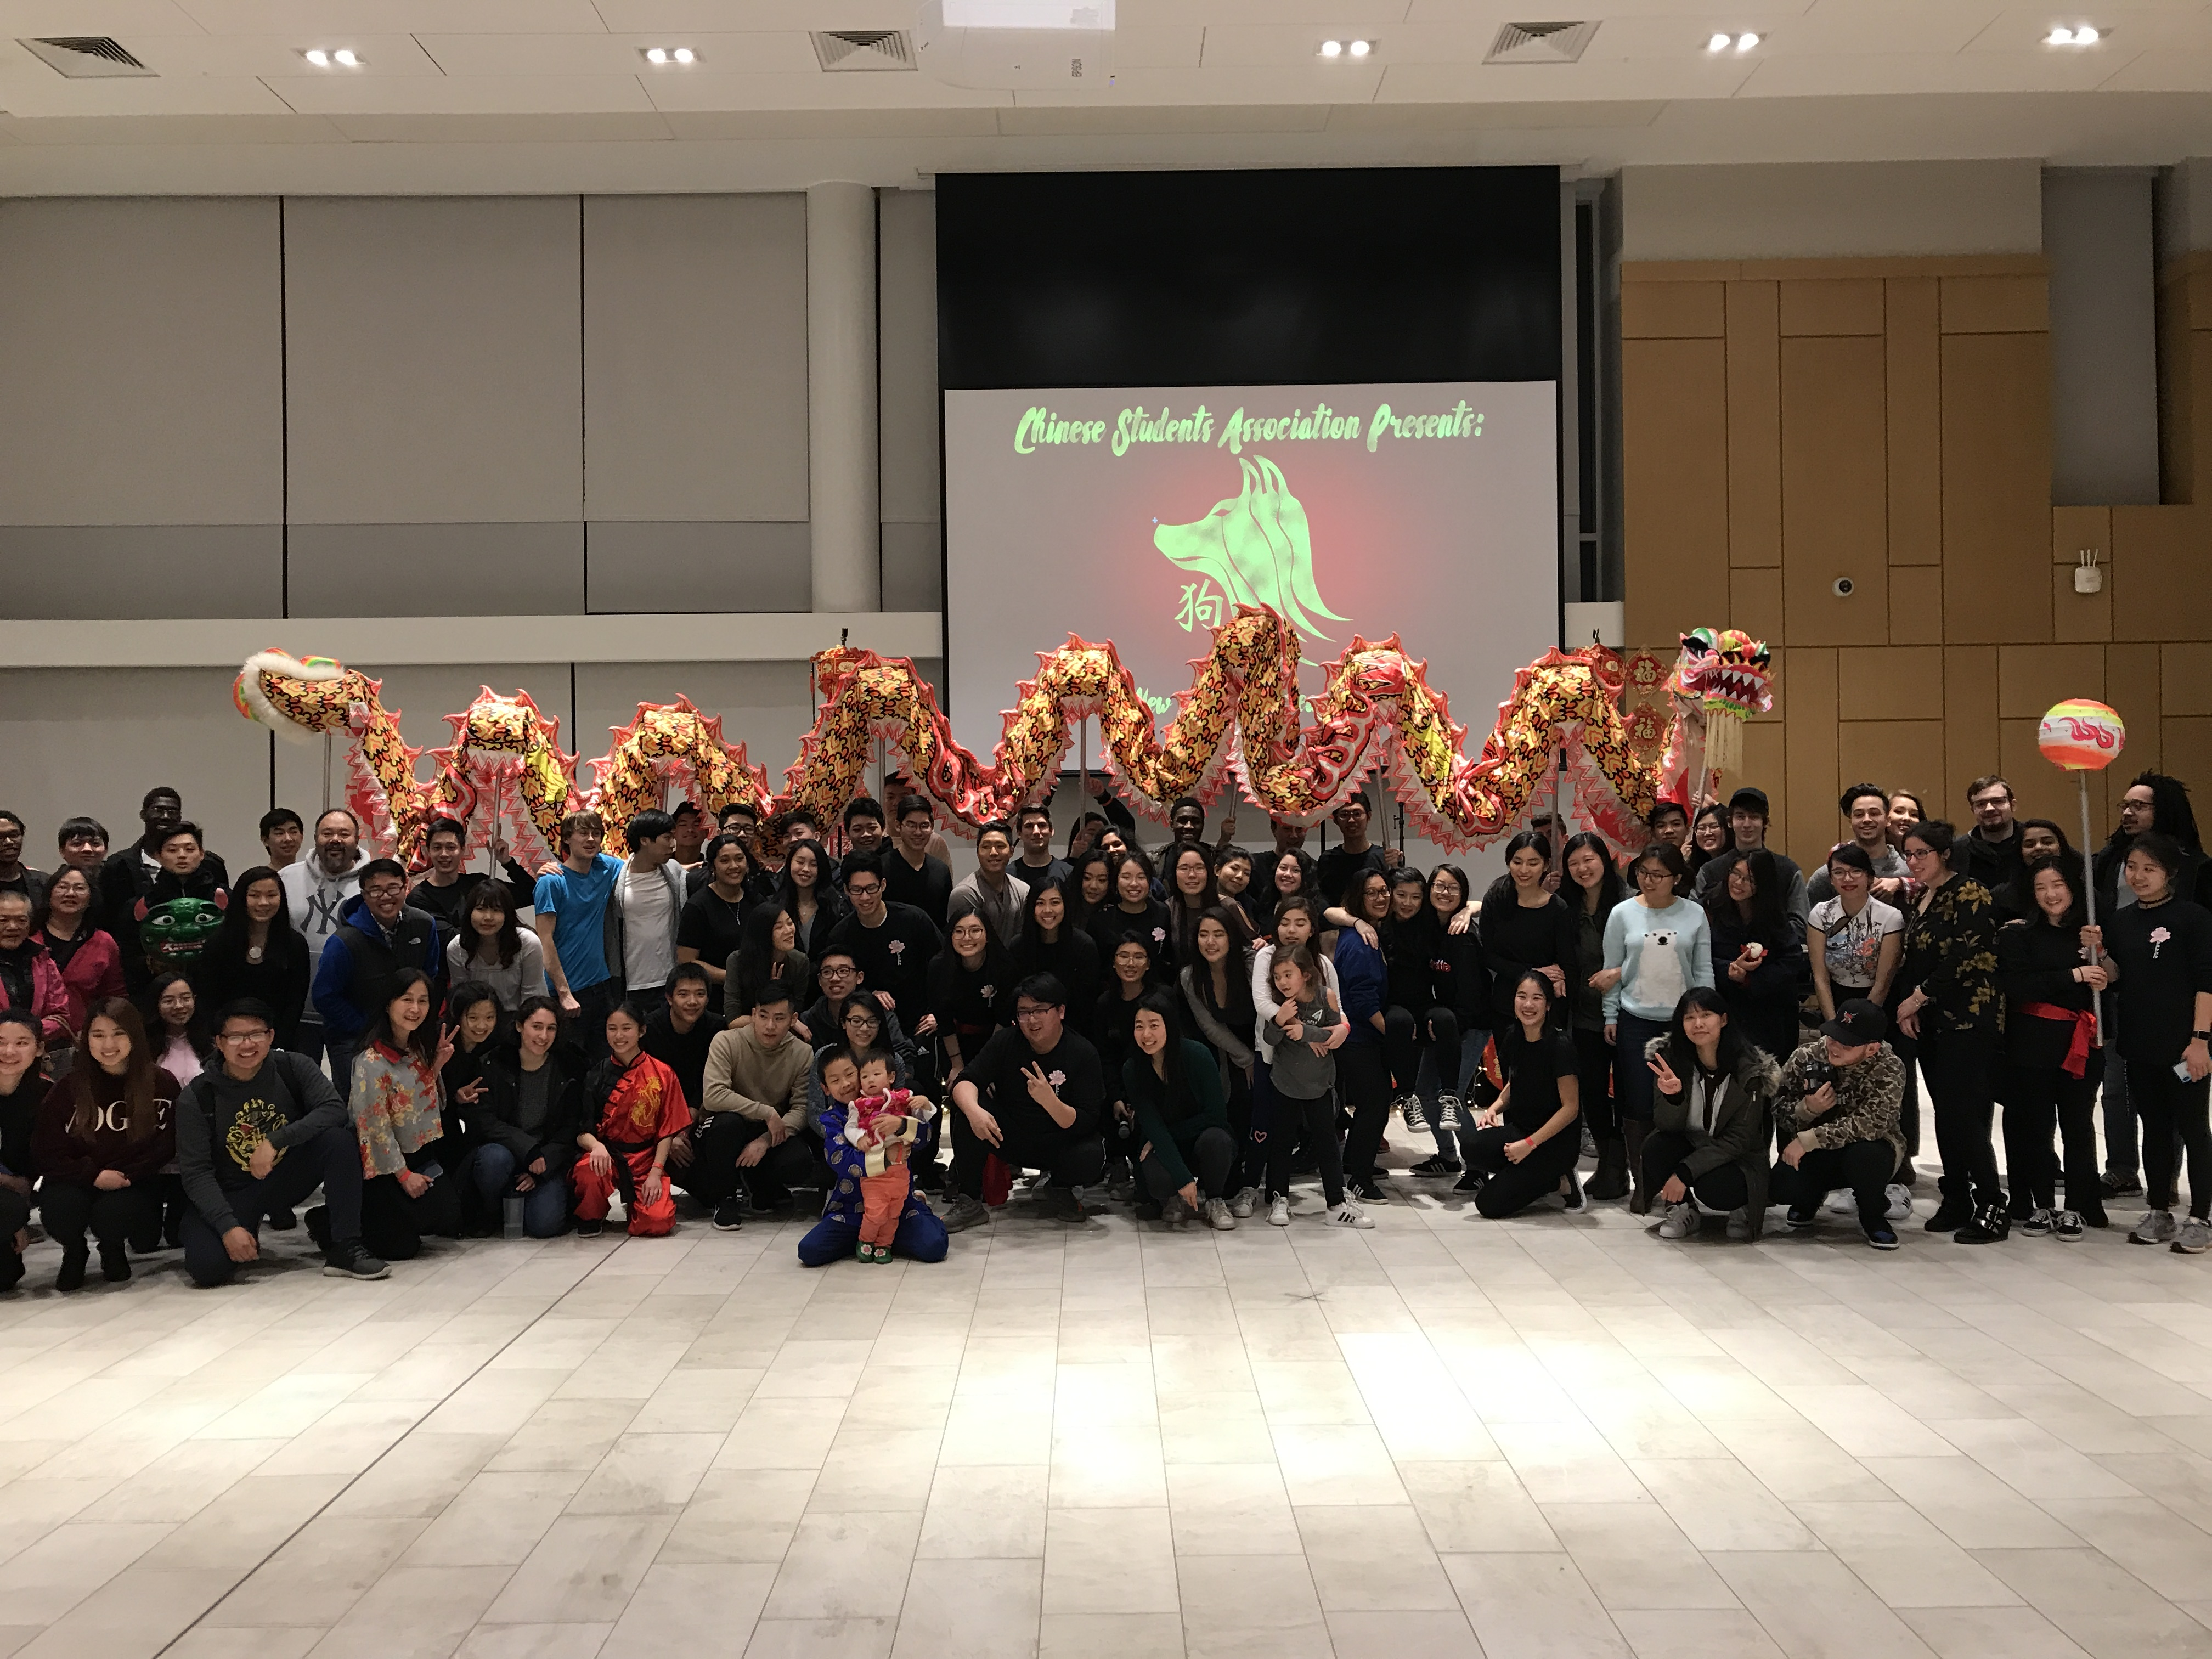 TCNJ Chinese Students Association New Year Celebration, Feb. 24, 2018: